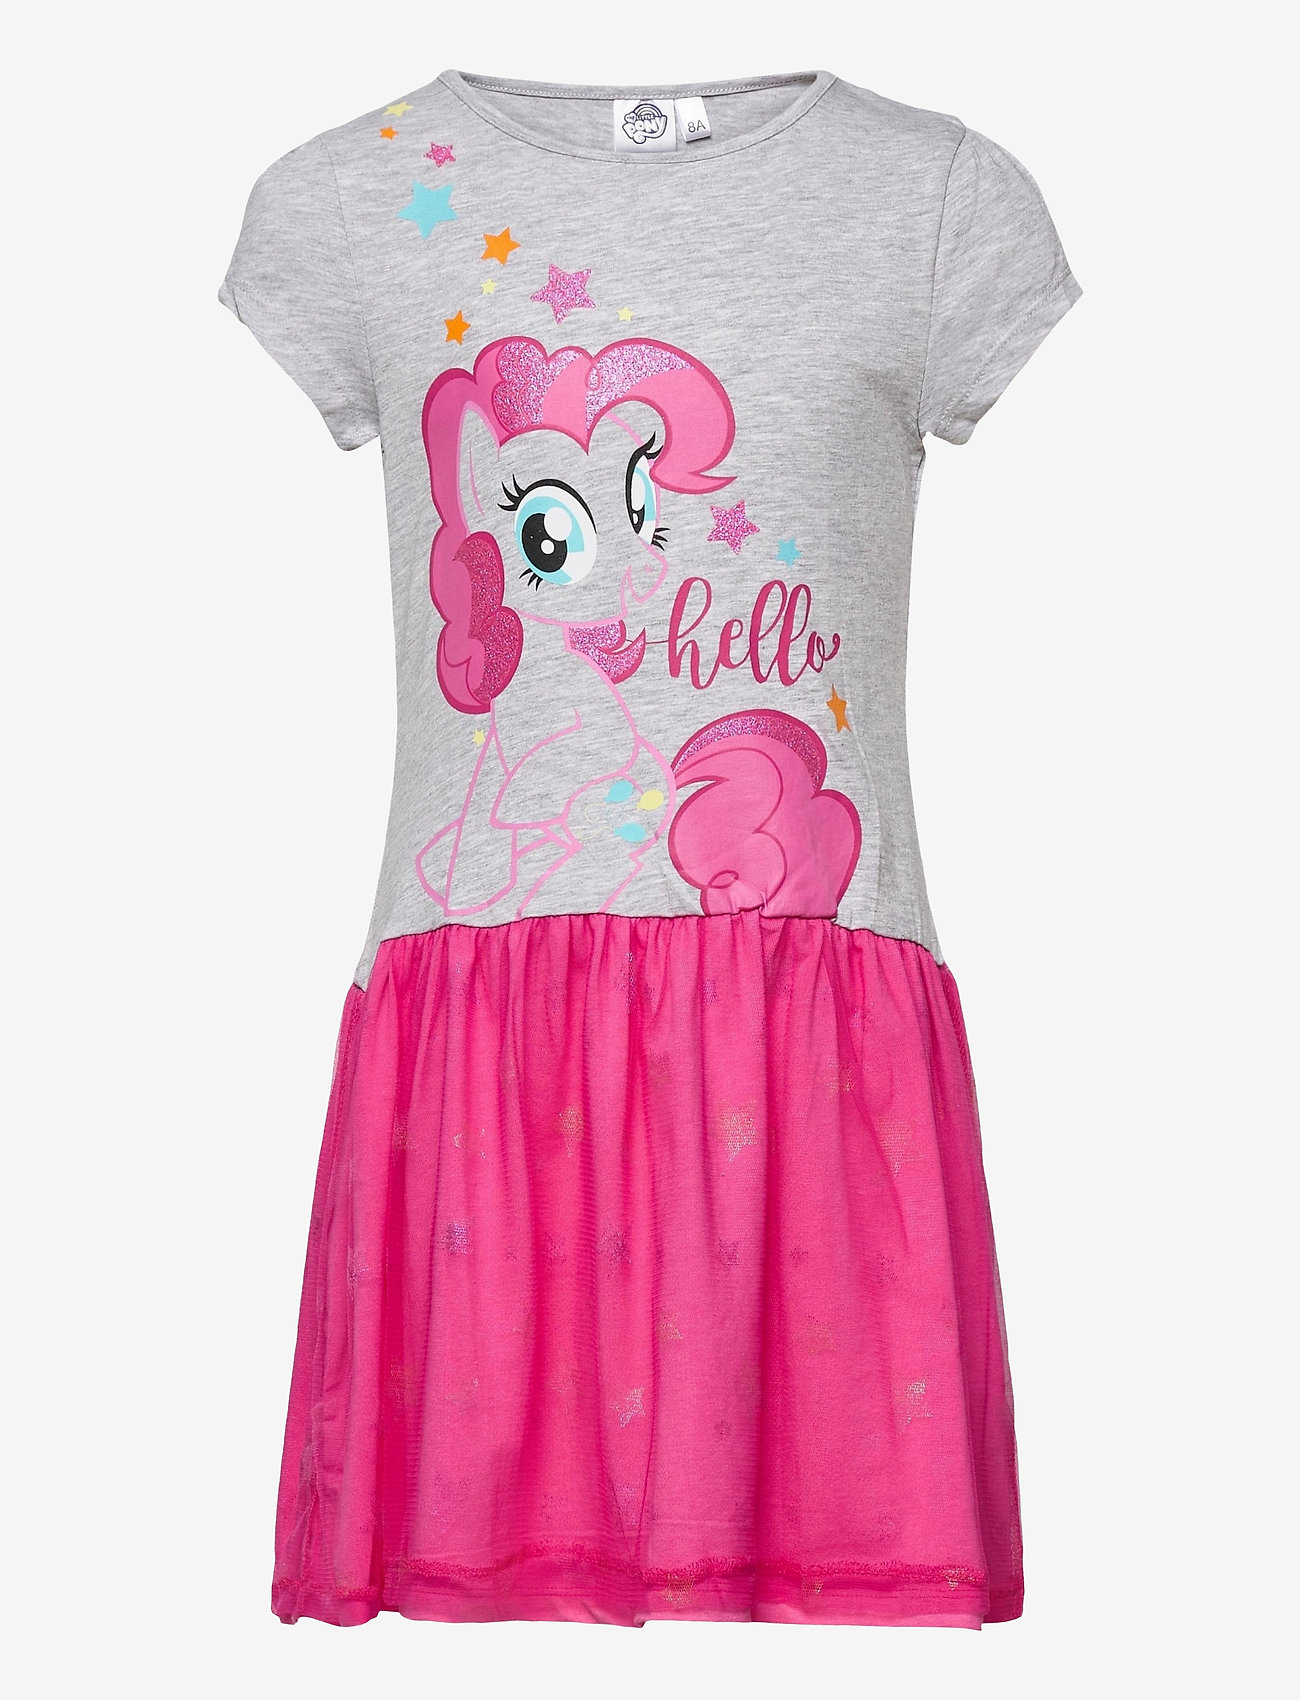 My Little Pony - SHORT SLEEVE DRESS - kleider - lgrey - 0